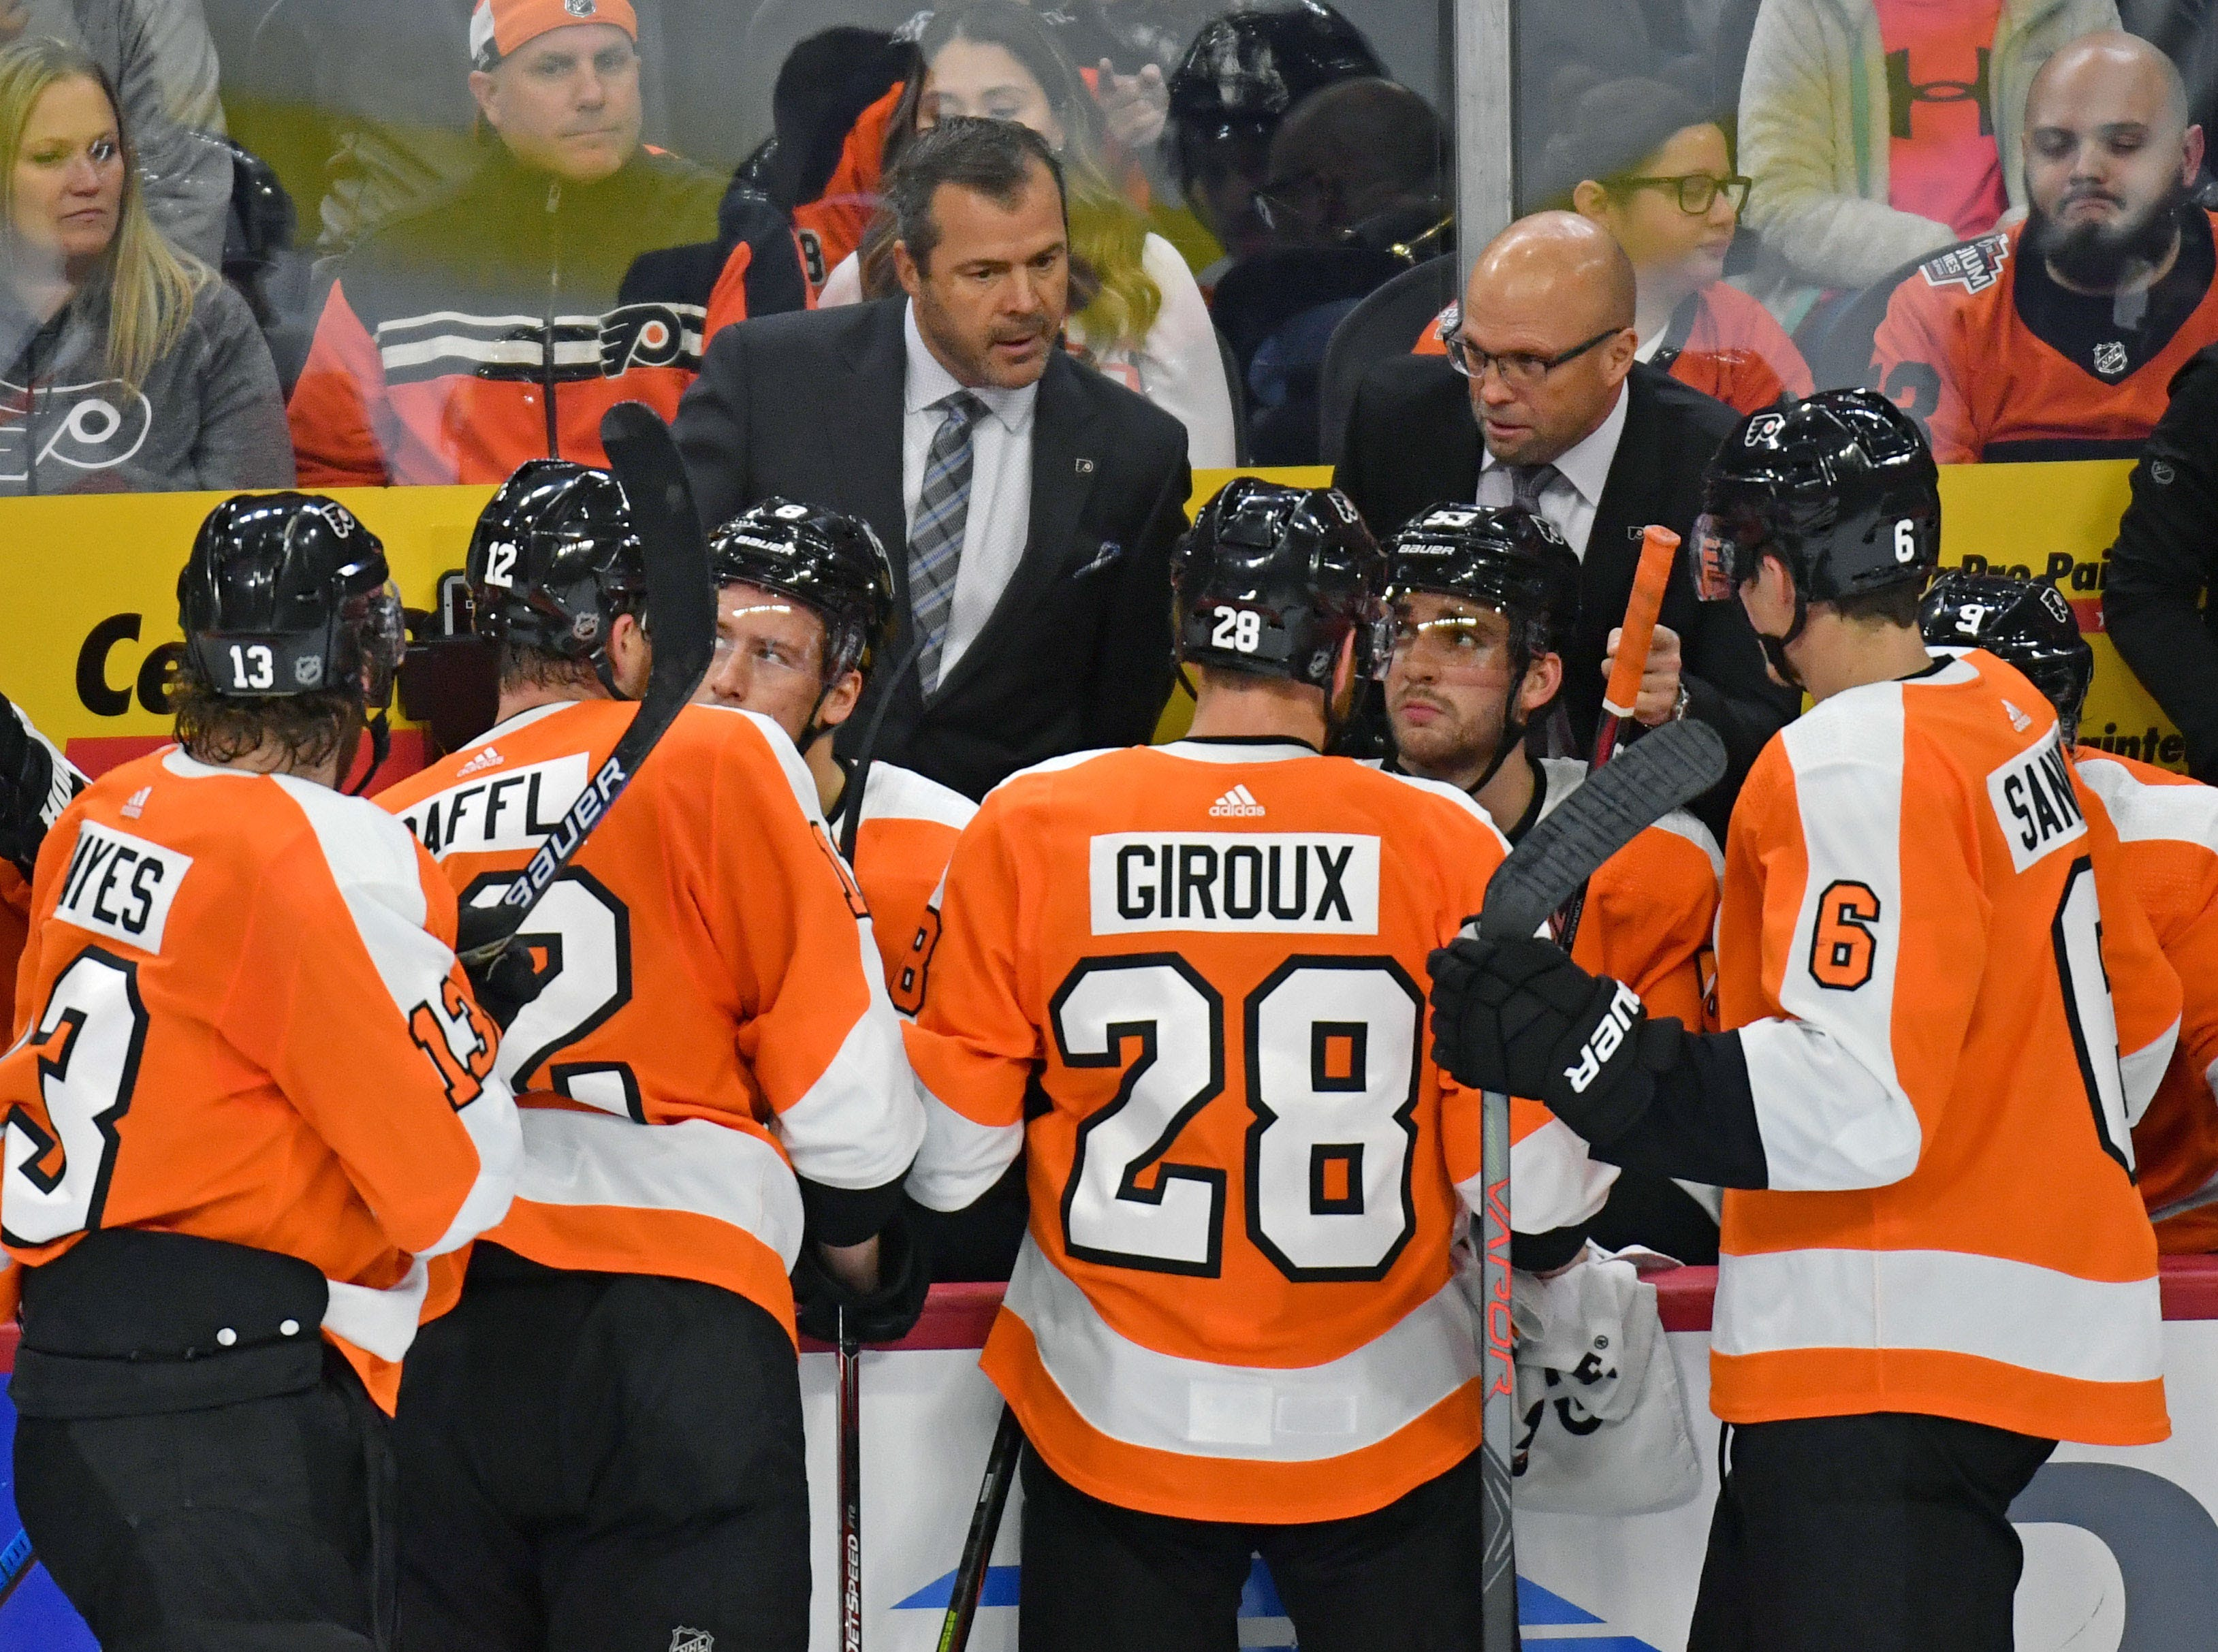 With season on the line, Alain Vigneault looks to Flyers' leaders